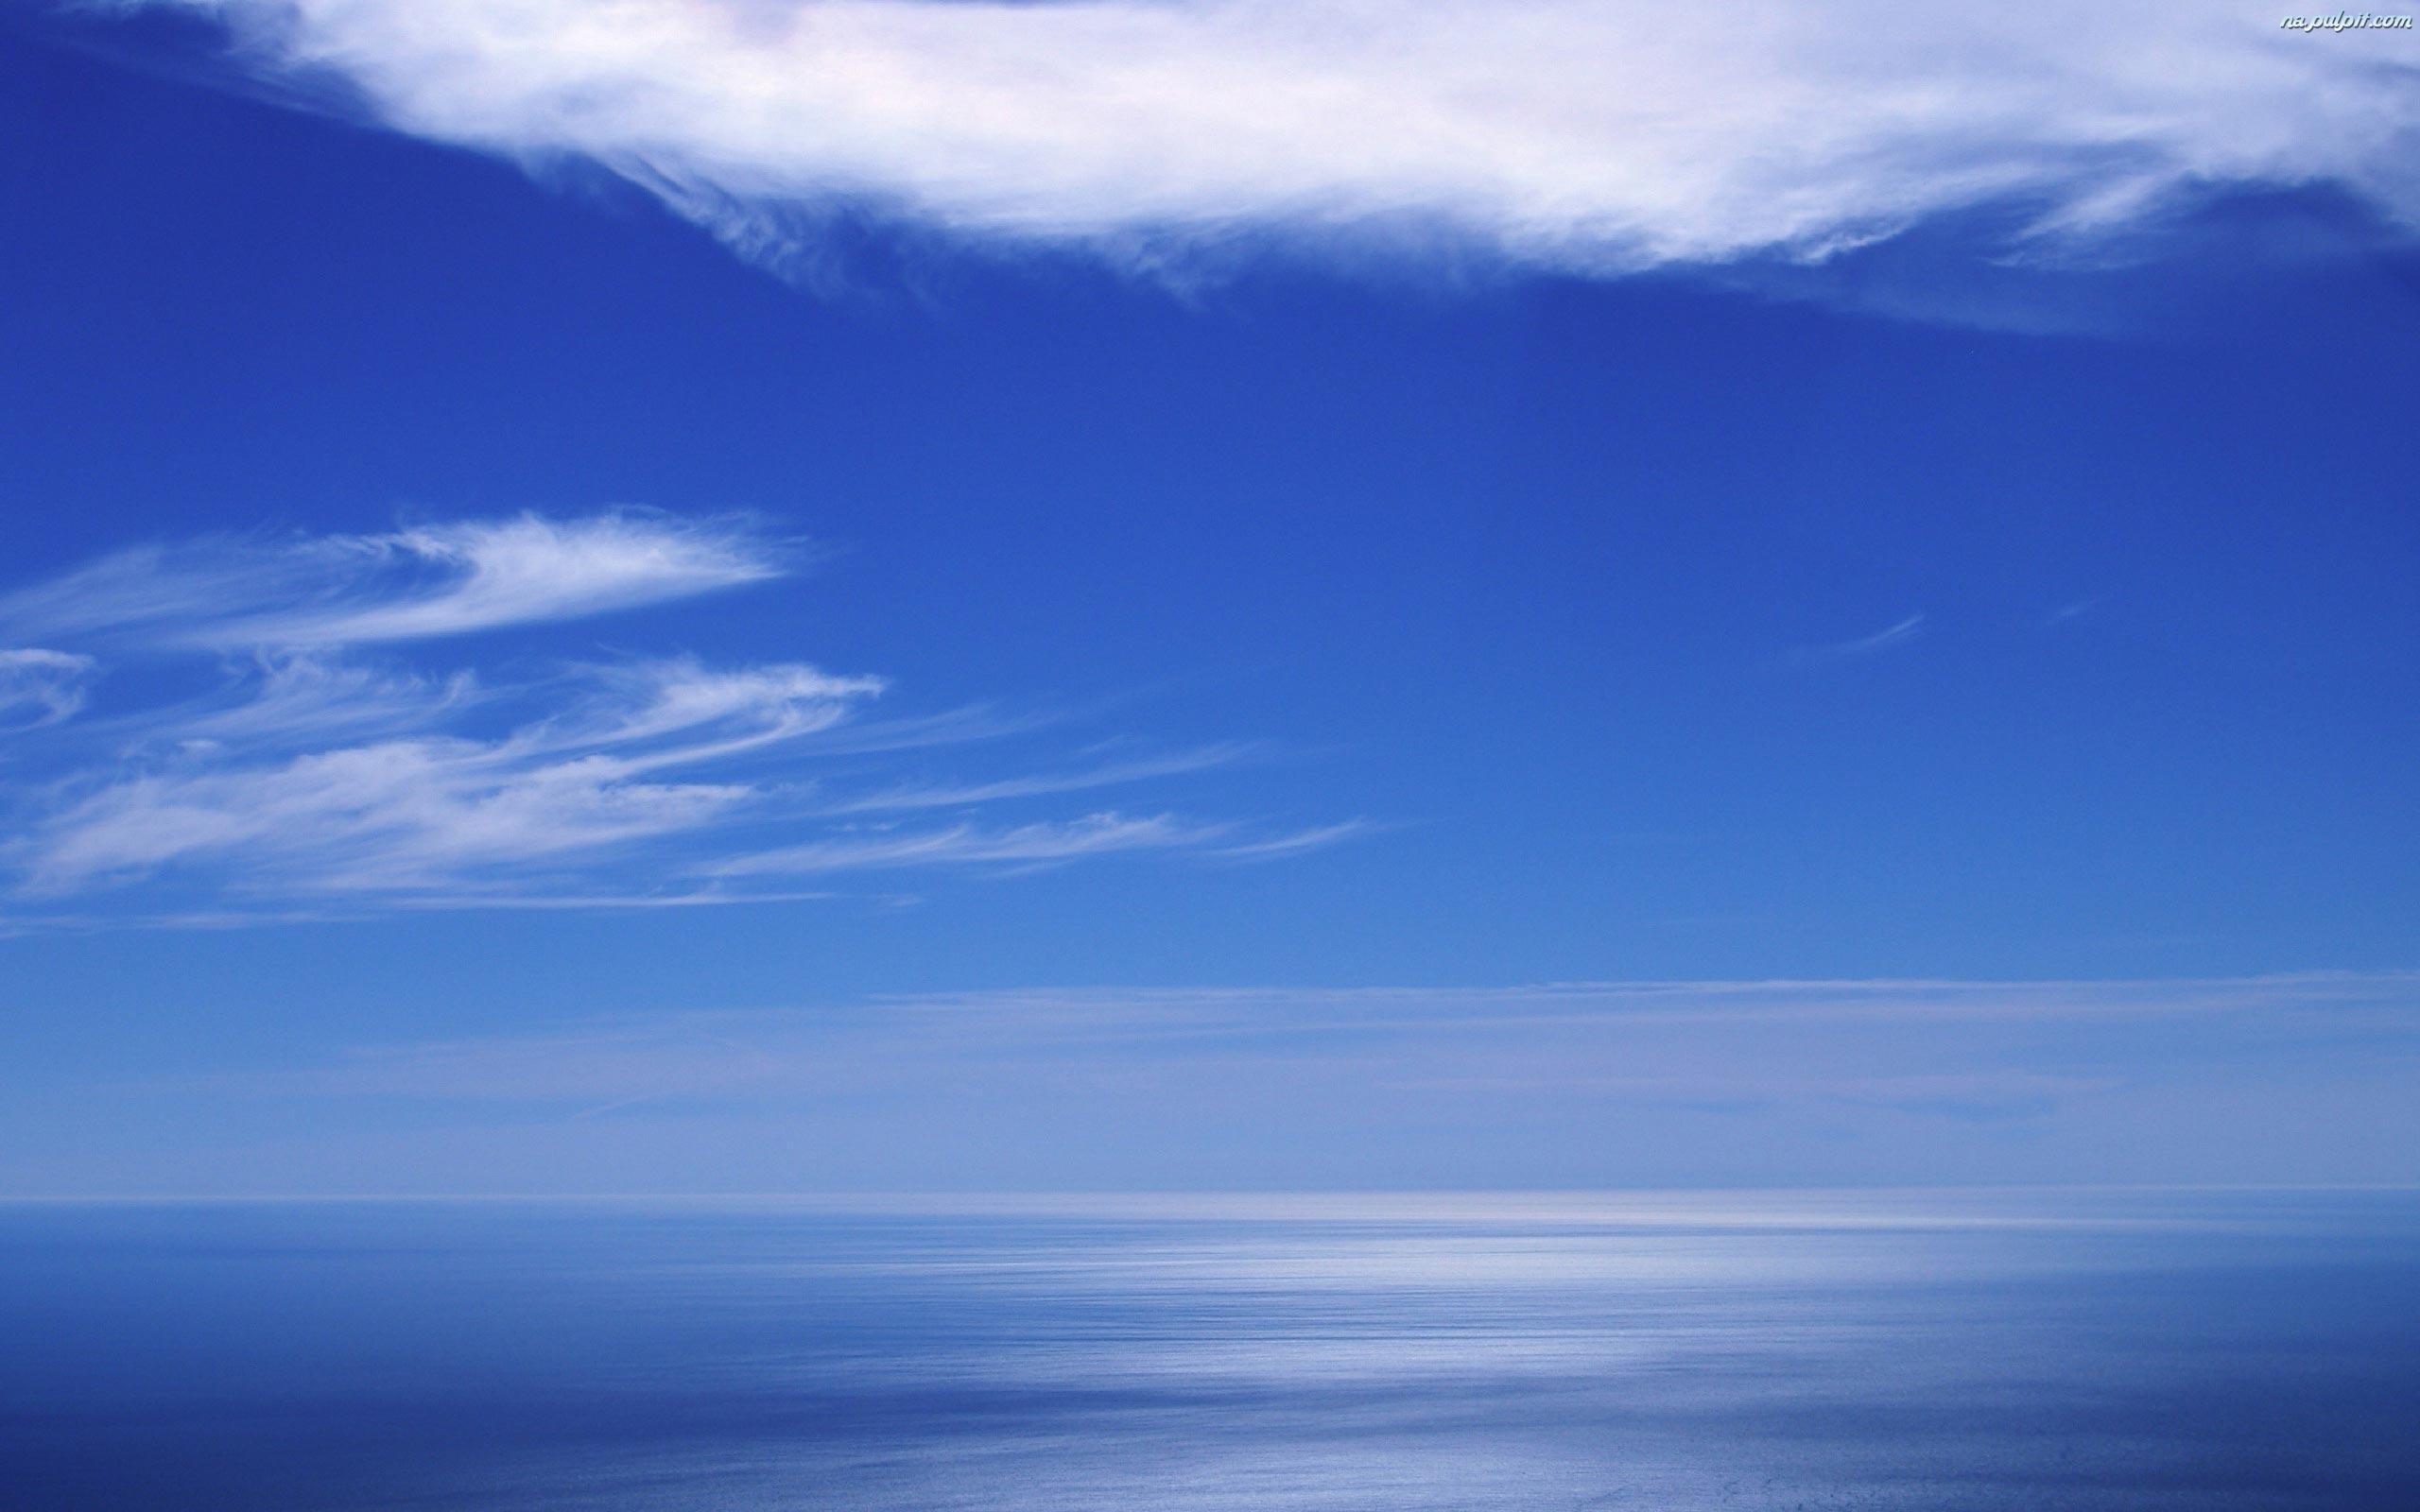 niebo-tafla-morza-blekitne